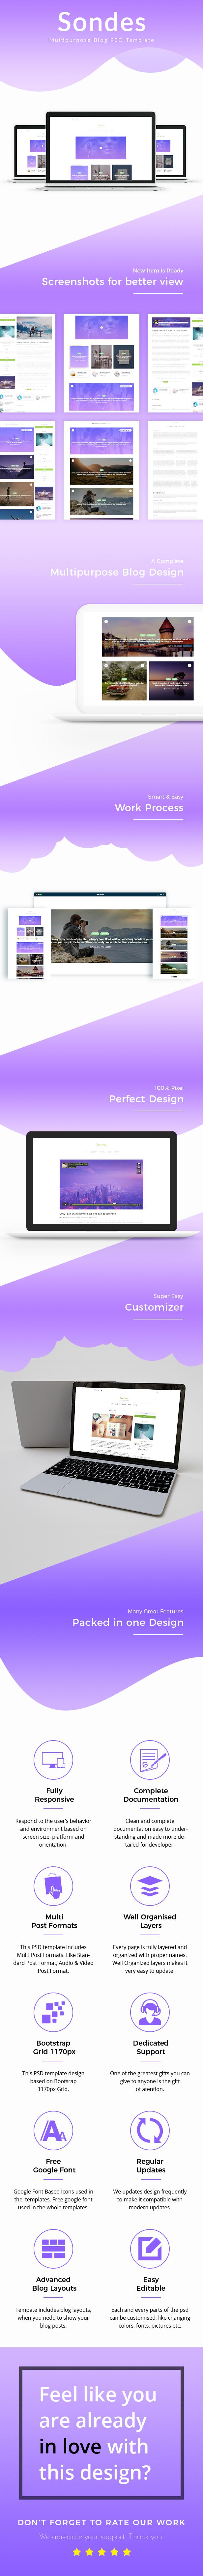 Premium Themes Sondes